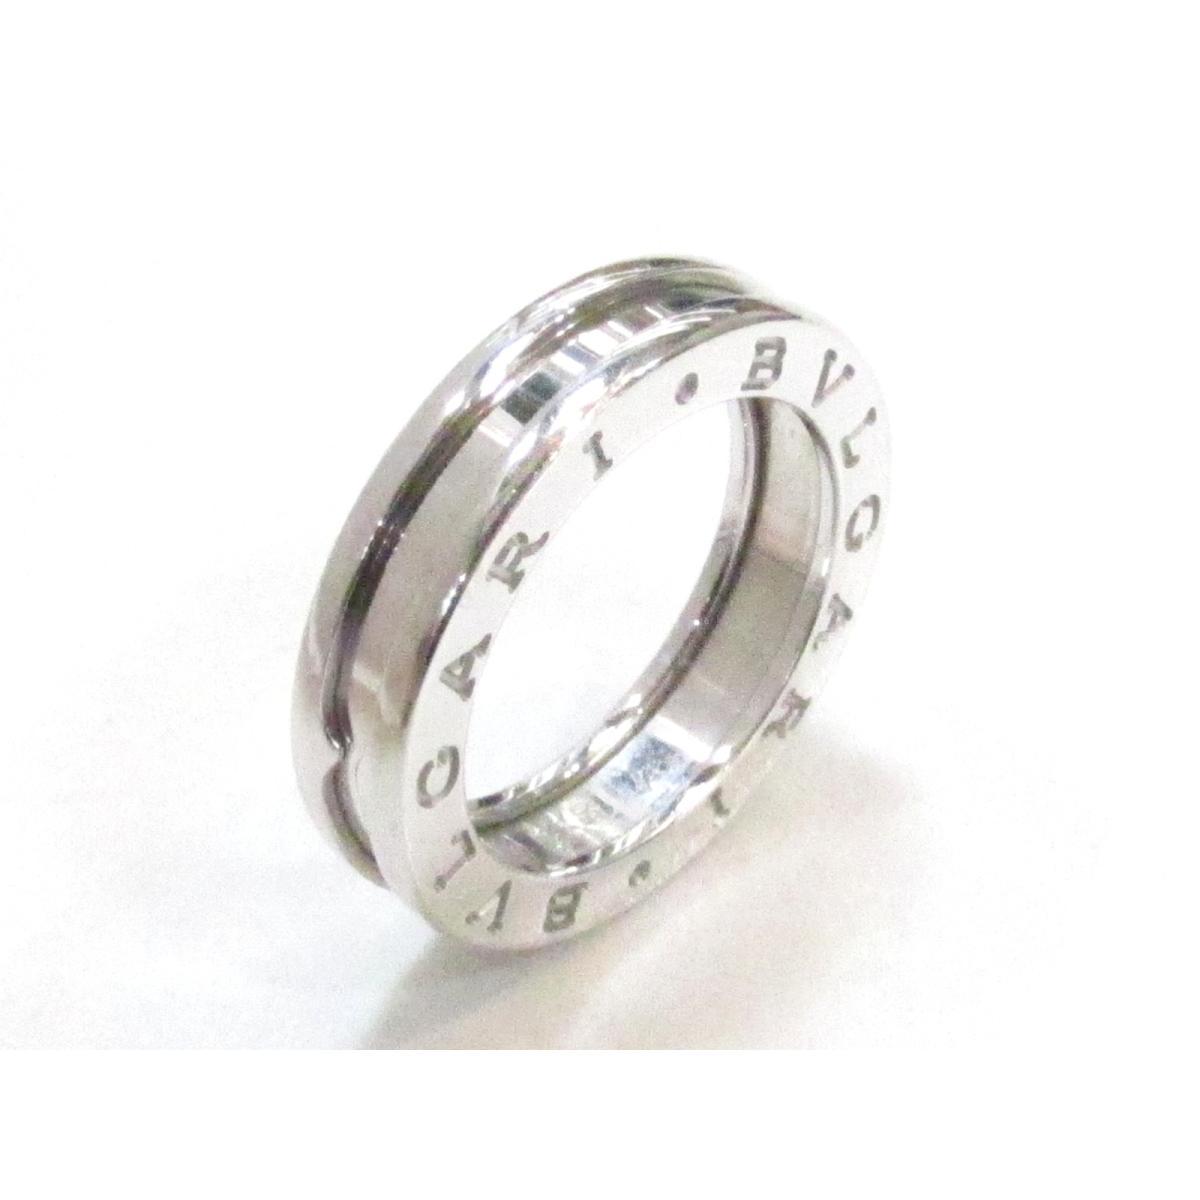 cab998fb810d 【中古】 ブルガリ B-zero1 リング x Sサイズ 指輪 メンズ レディース K18WG (750) ホワイトゴールド   BVLGARI リング  18K 18金 B-zero1 リング XSサイズ 美品 ...